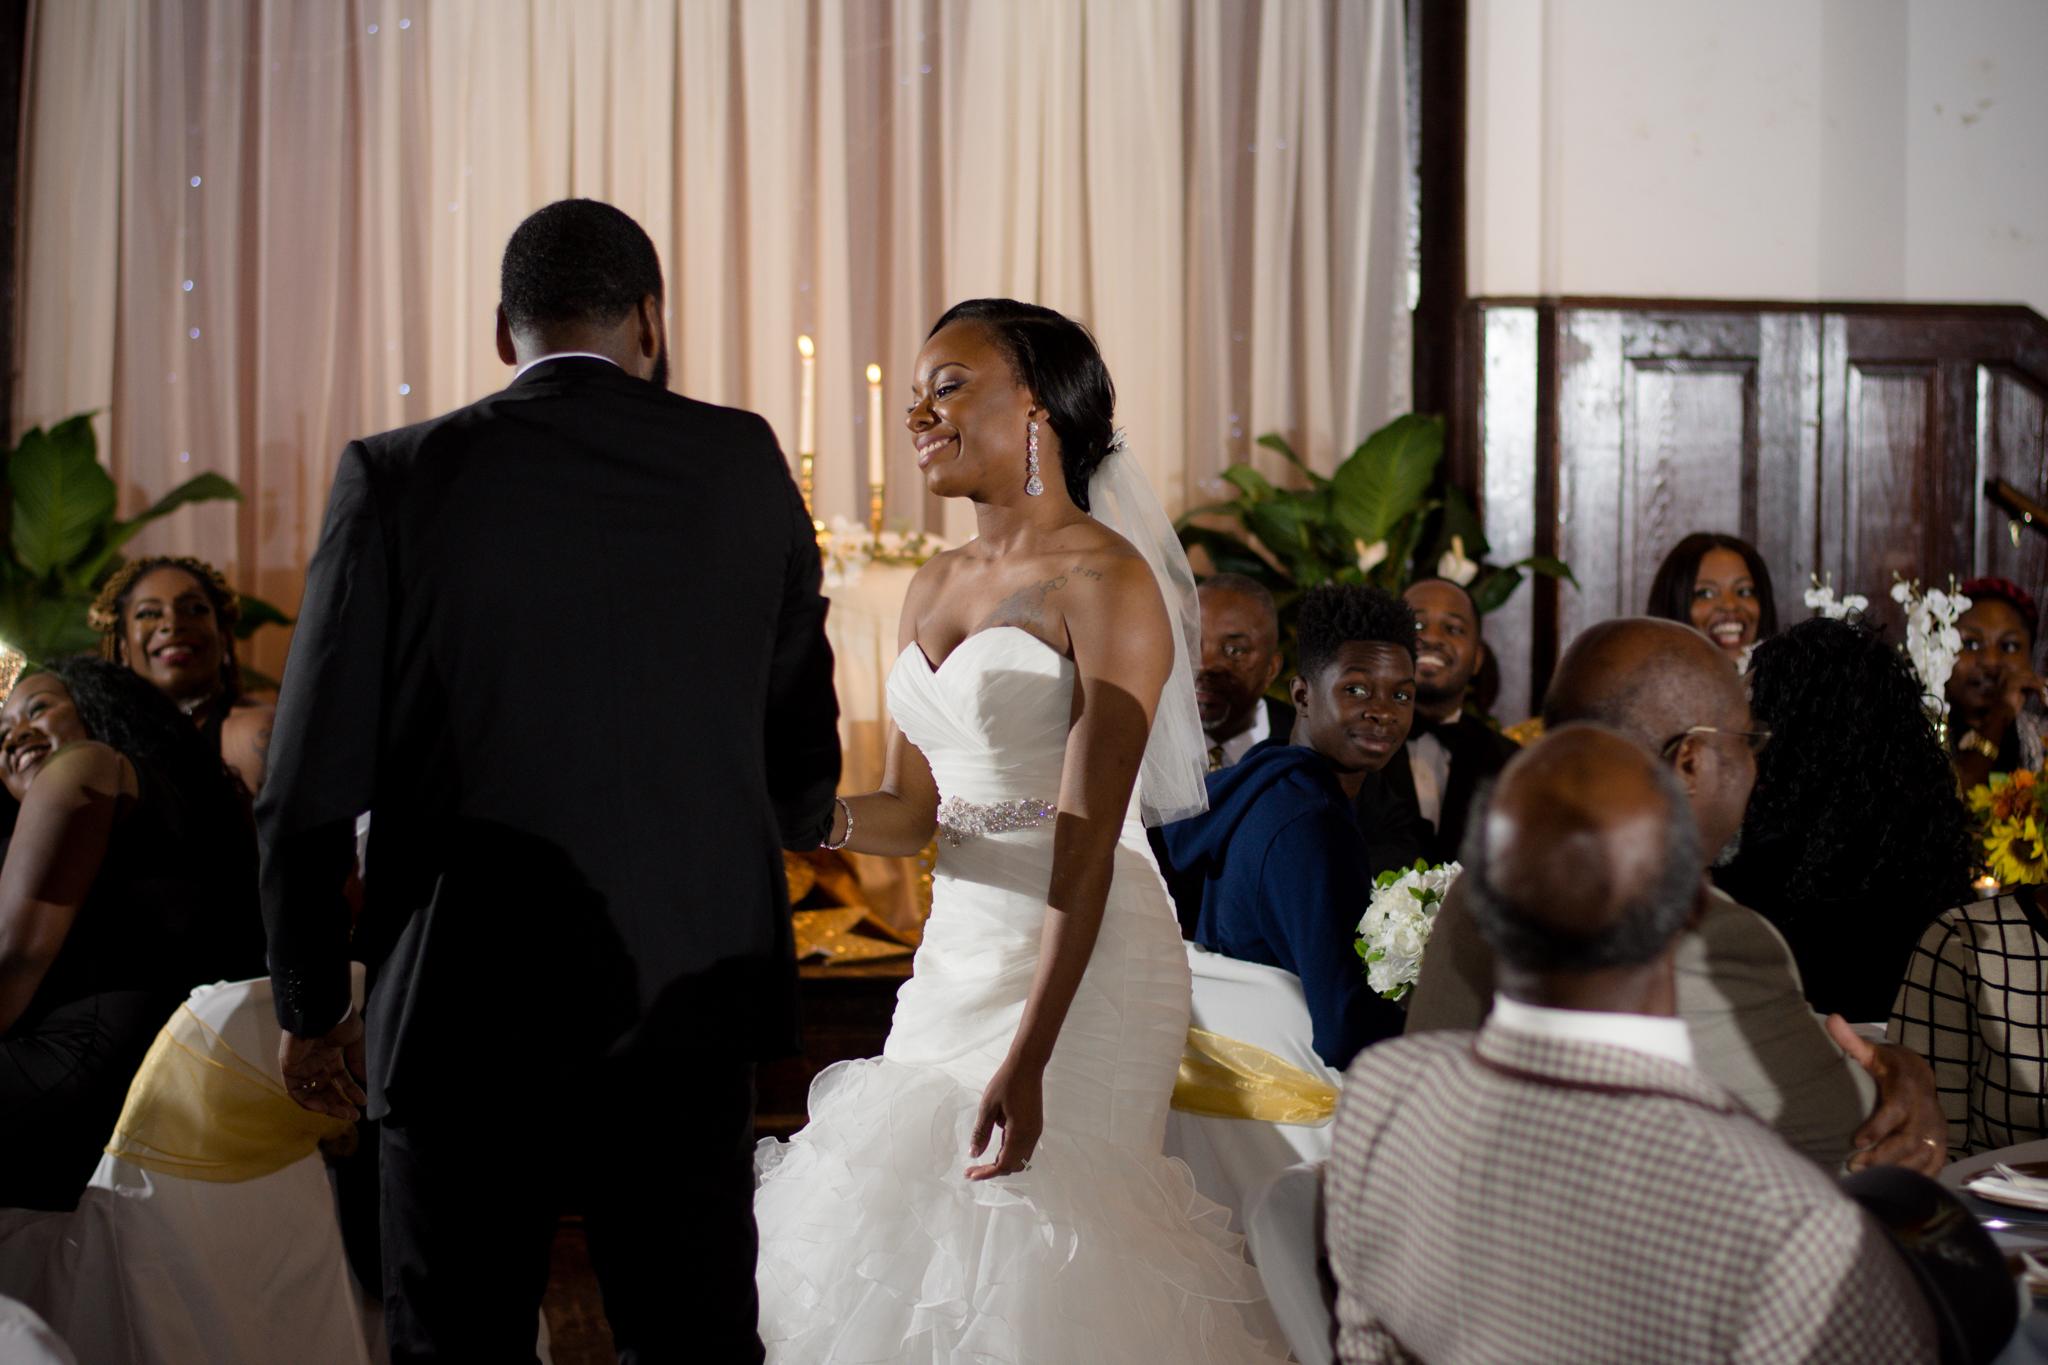 chaplin wedding (131 of 181).JPG